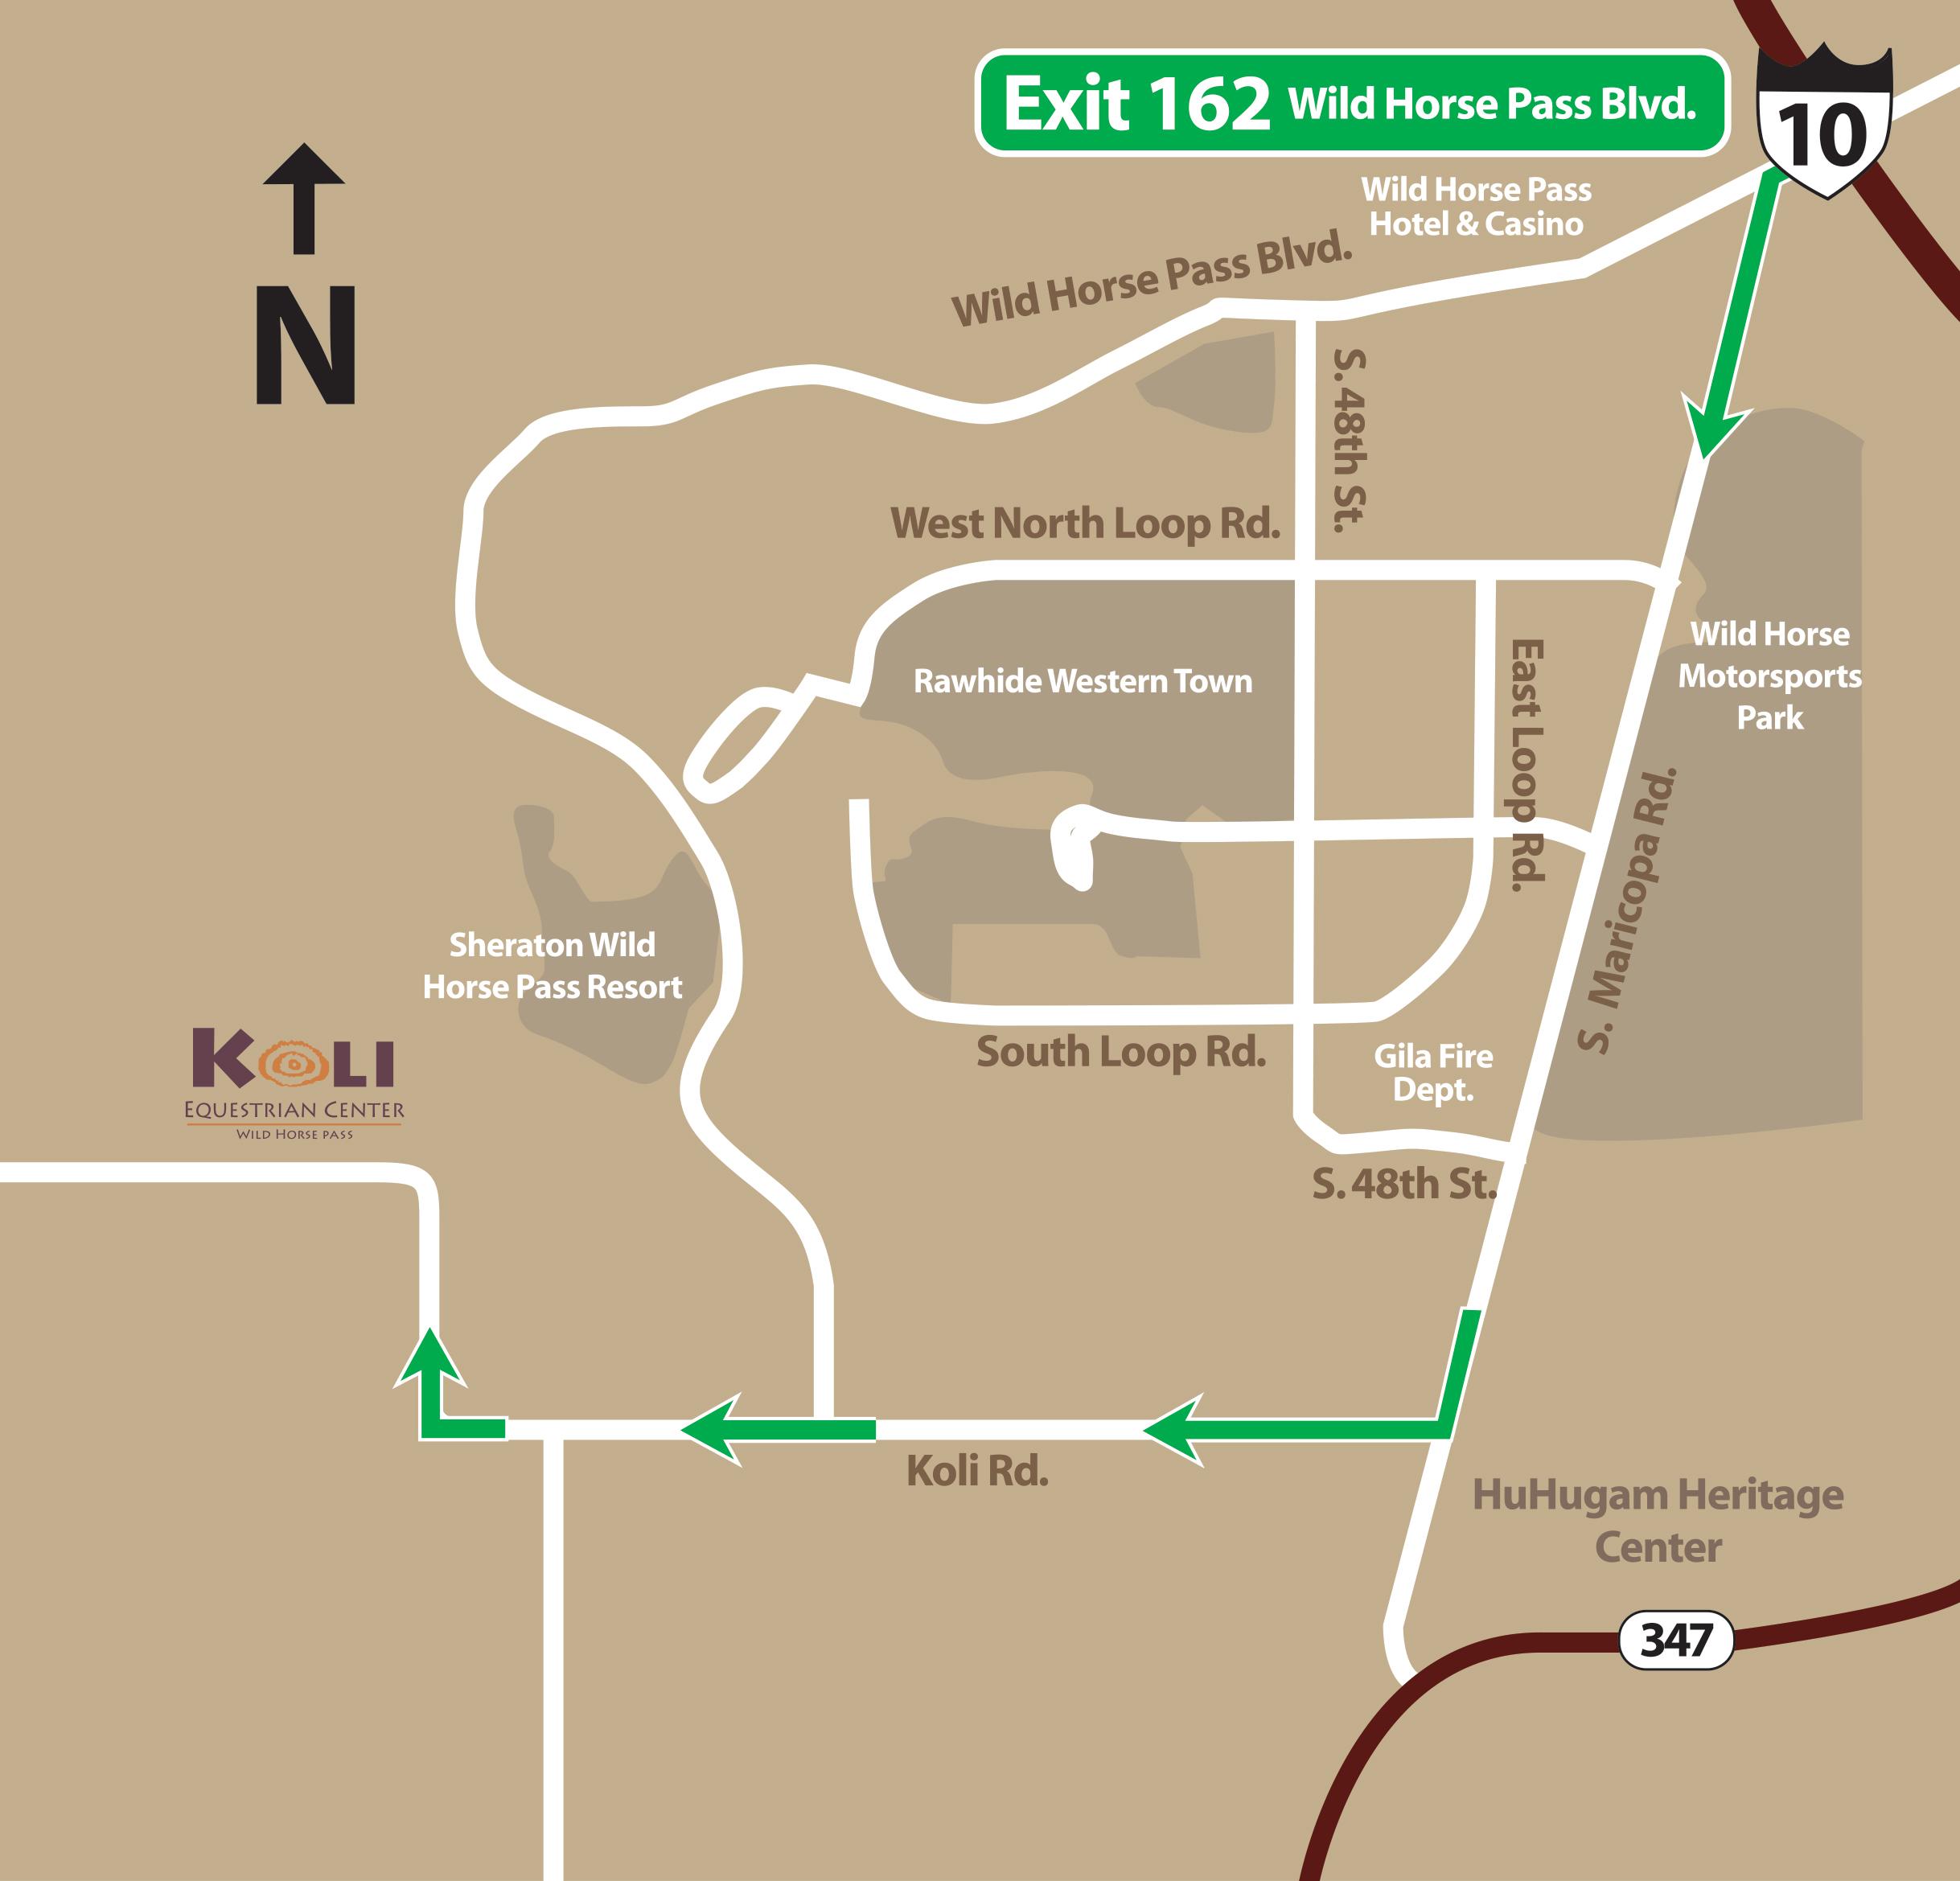 Koli Map Koli Equestrian Center Phoenix Horseback